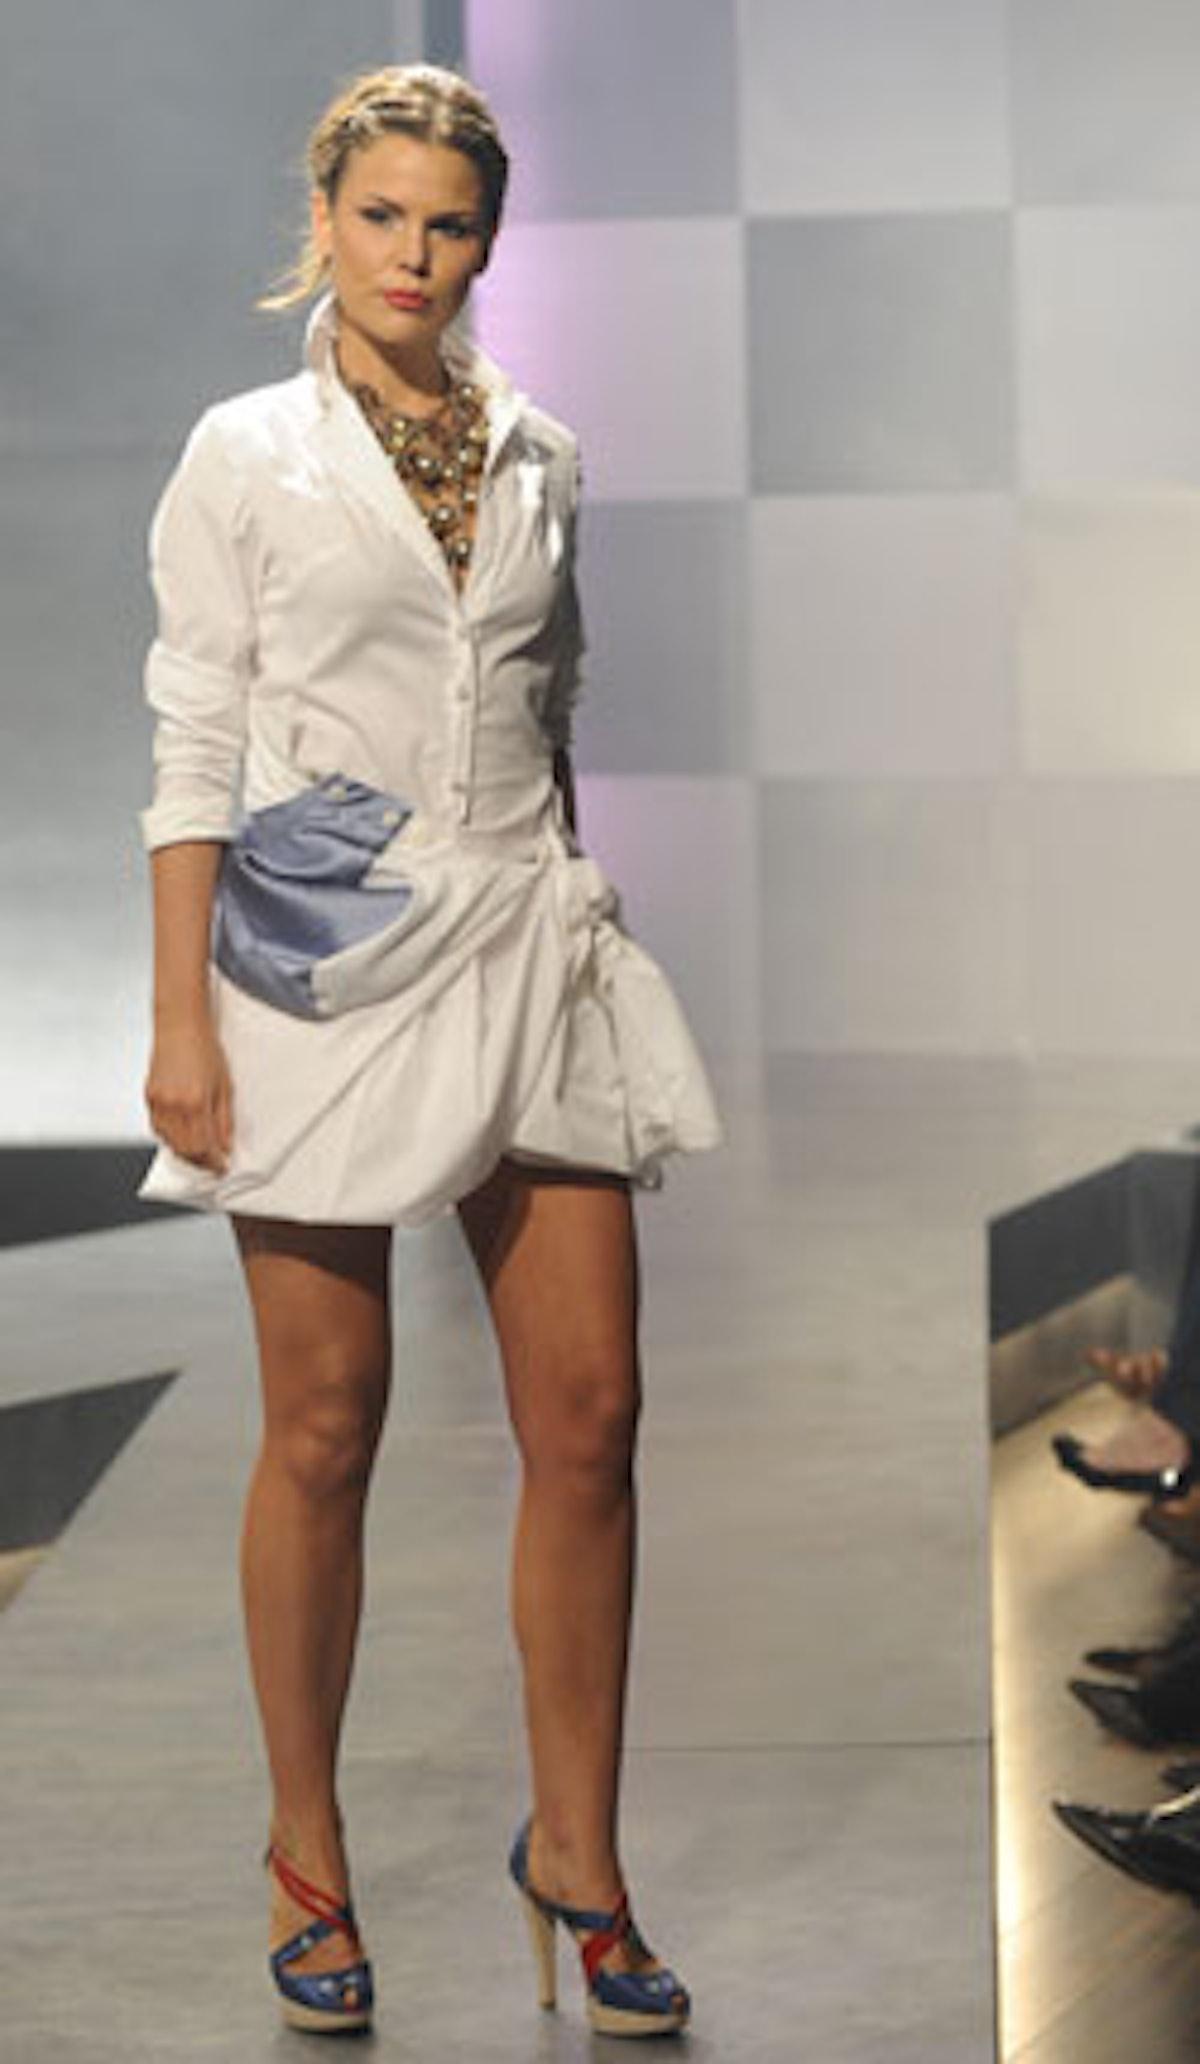 blog_angelchang_dress.jpg